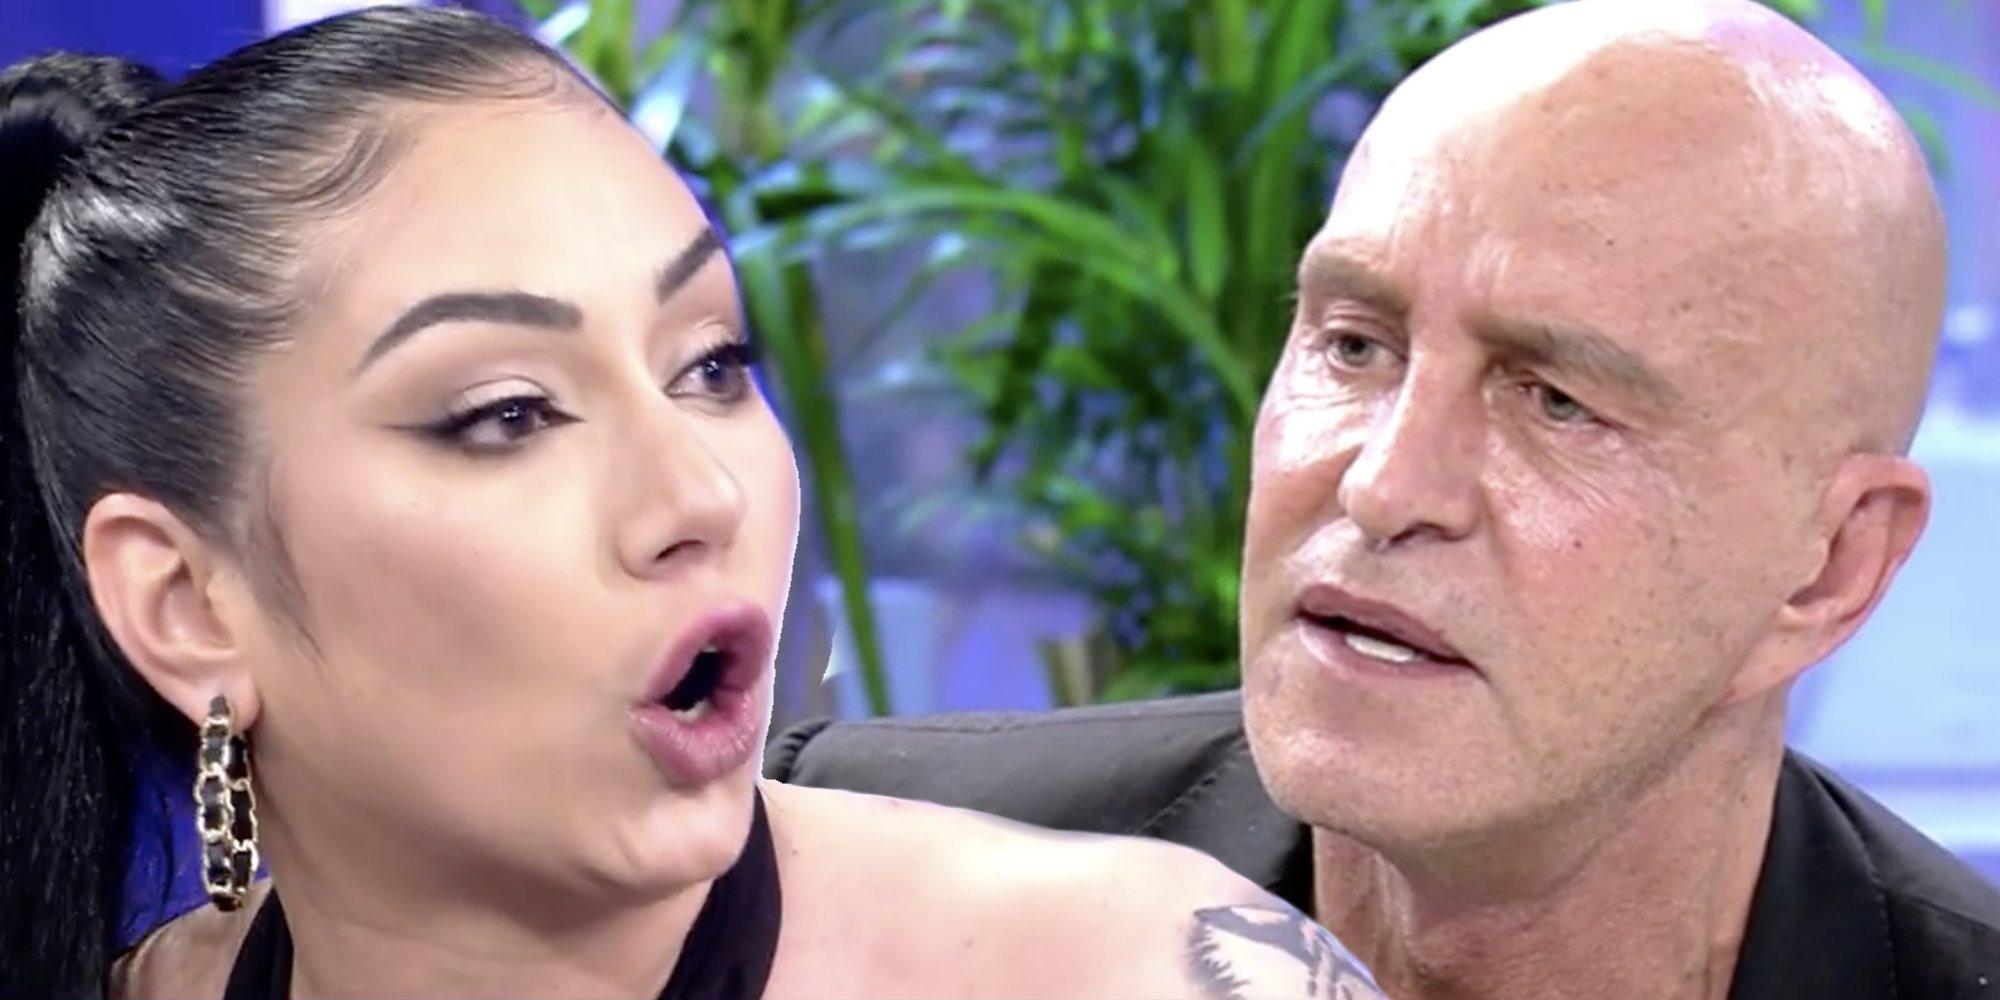 Kiko Matamoros abandona el plató de 'Sábado Deluxe' tras un enfrentamiento con Dakota Tárraga